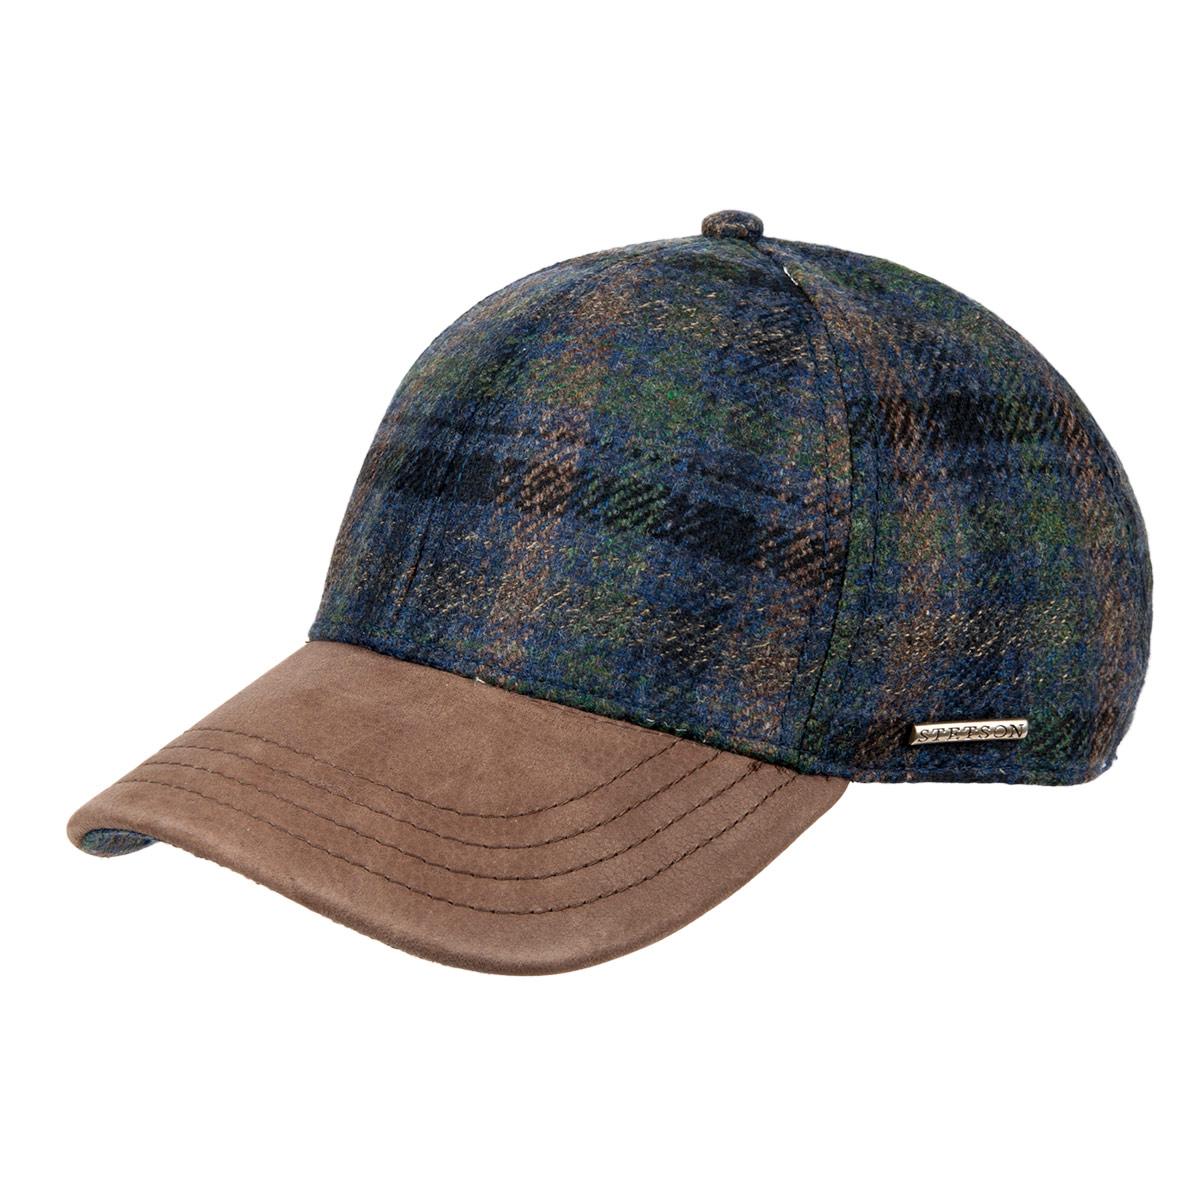 644e4b042dc baseball cap Wool Cashmere by STETSON baseball cap Wool Cashmere by STETSON  ...